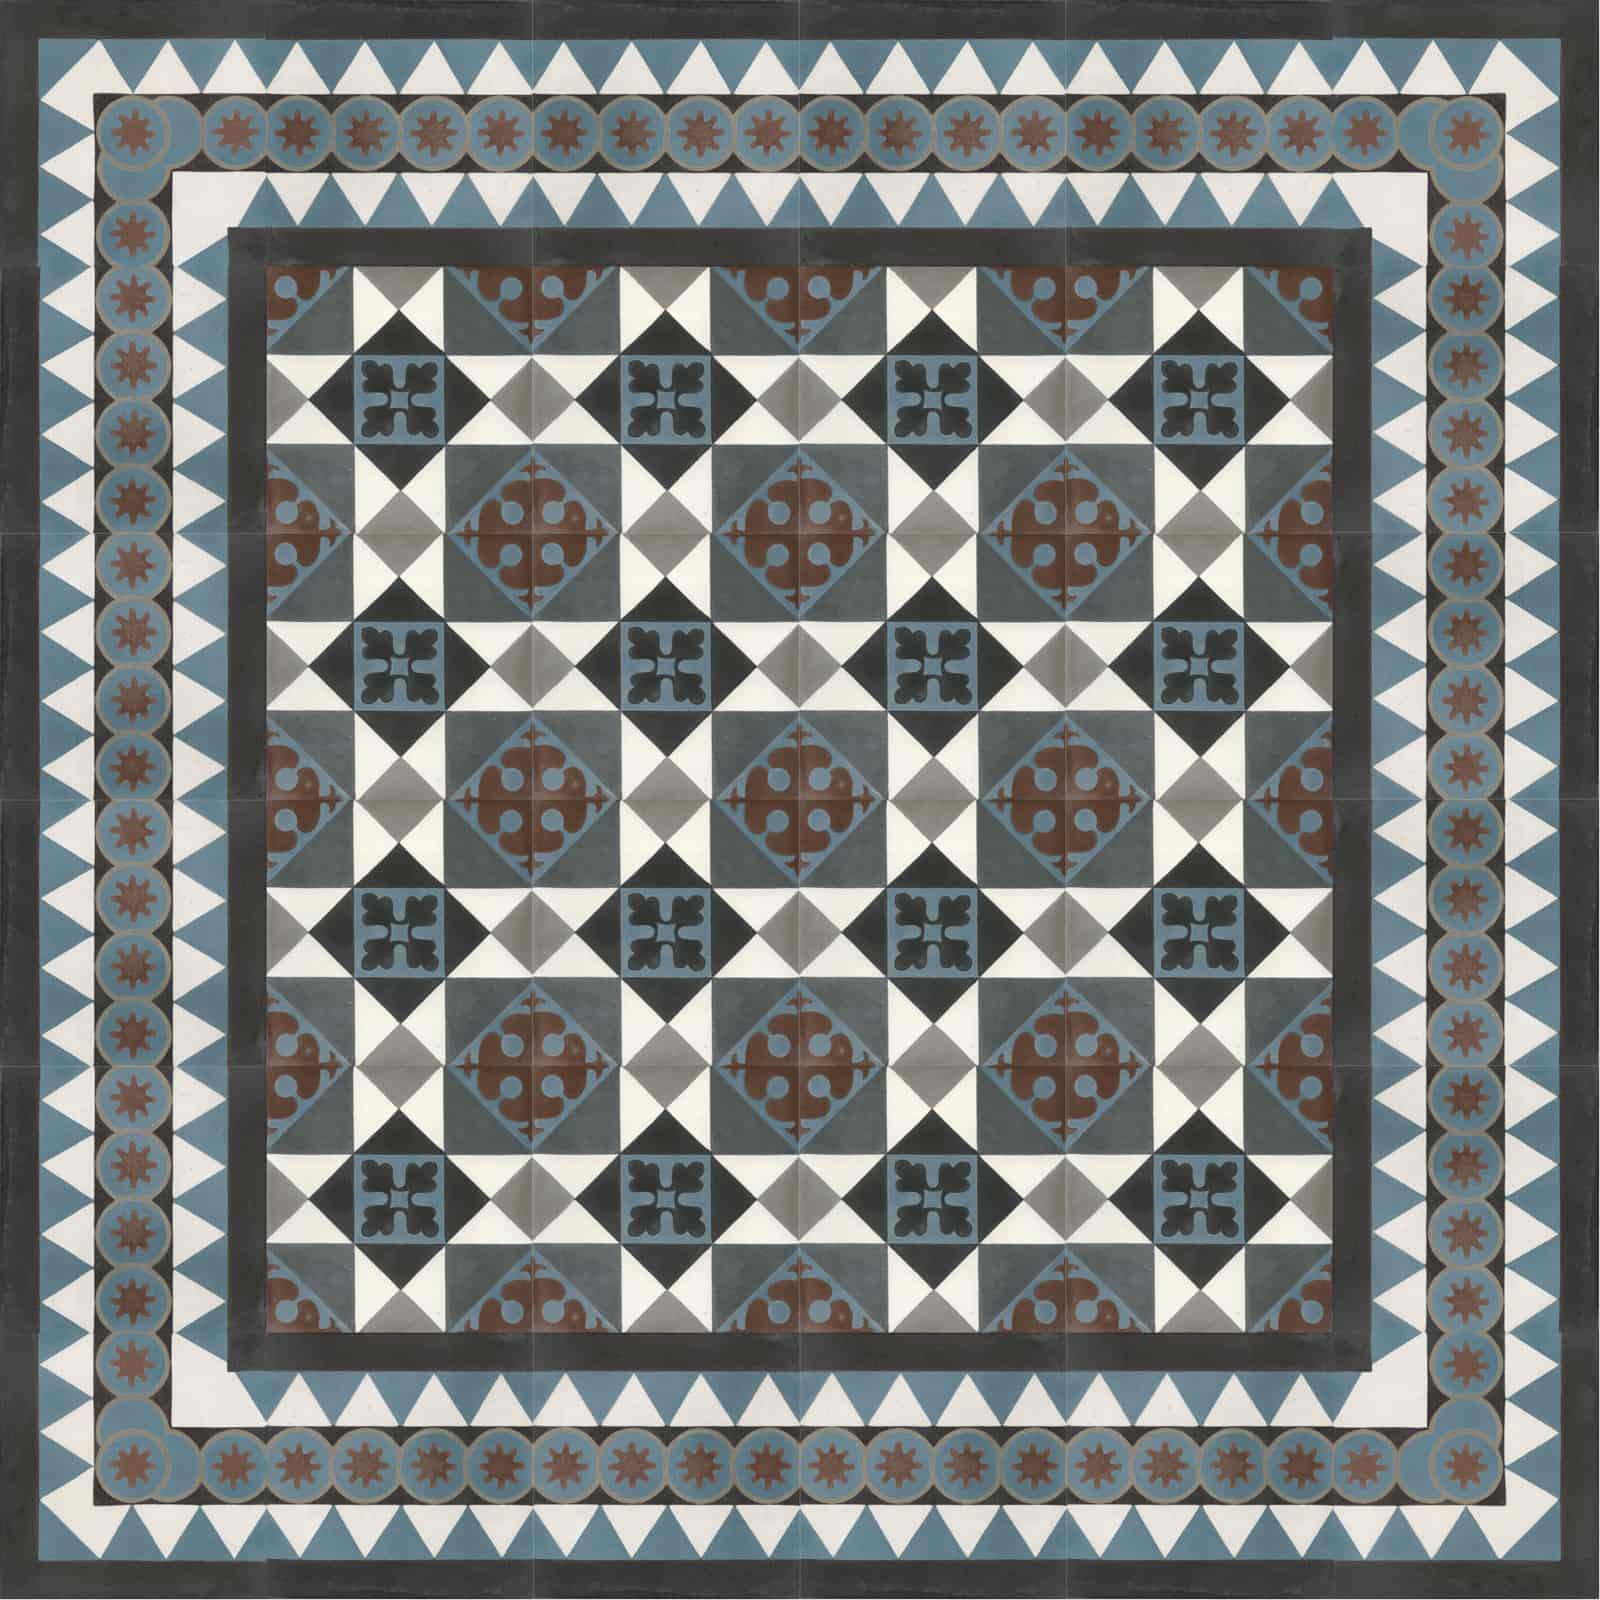 zementfliesen-verlegemuster-nummer-12572-viaplatten | 12572